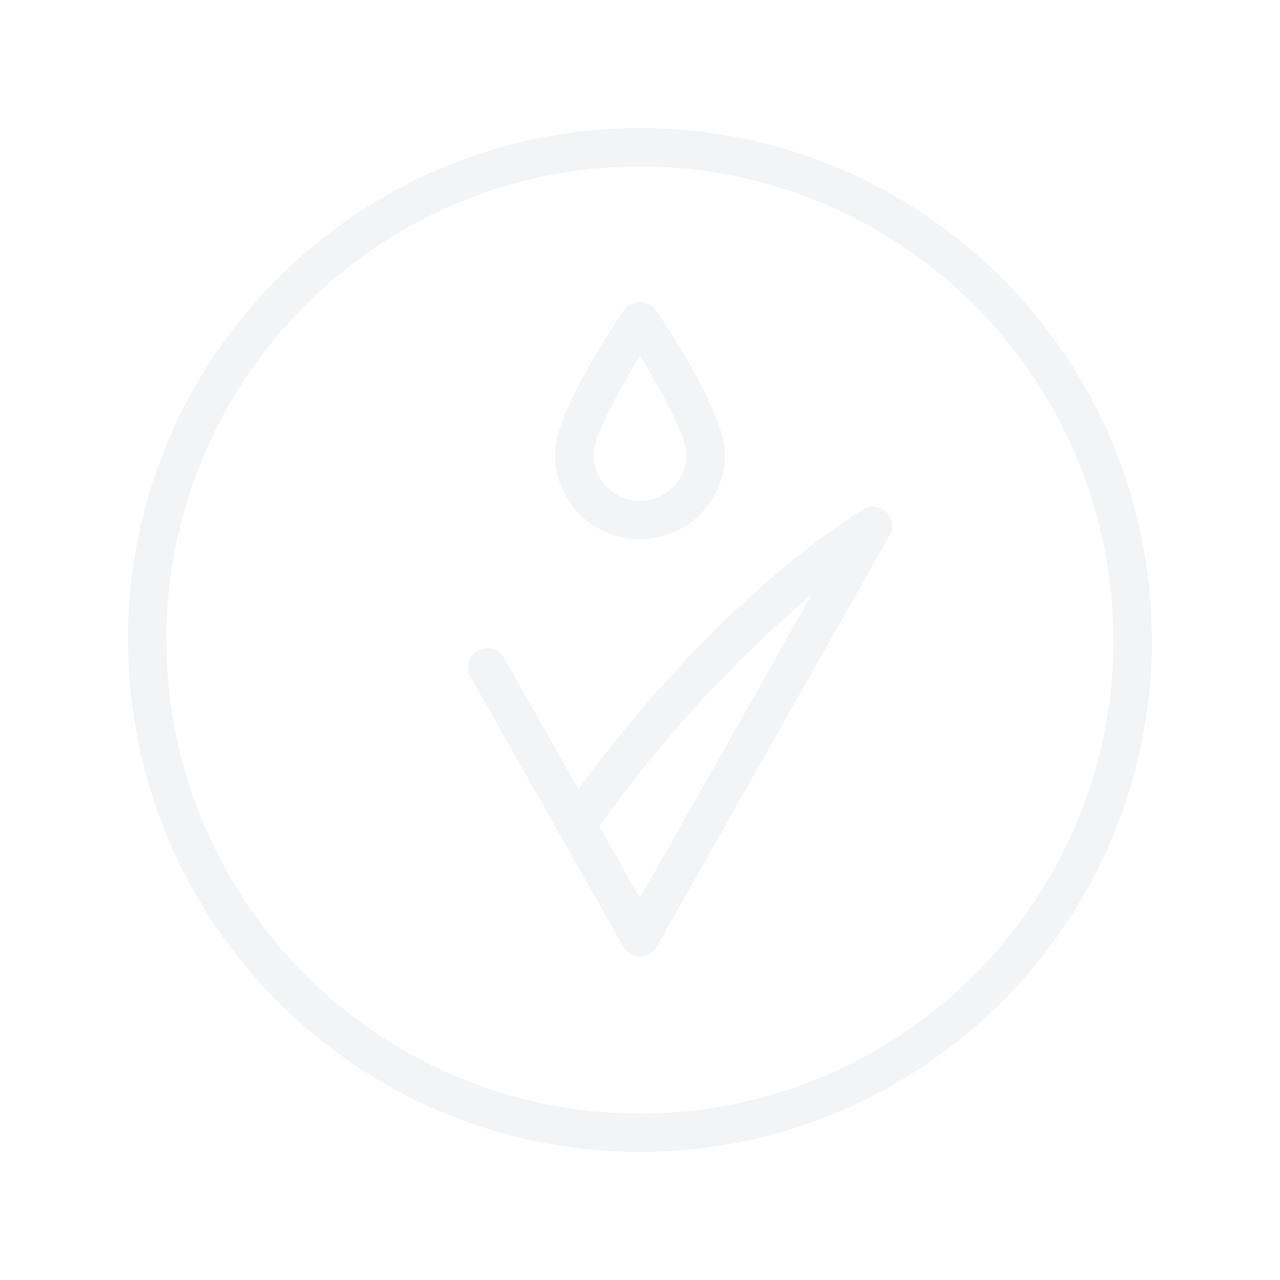 BATISTE Vanilla & Passionflower 2in1 Dry сухой шампунь 200ml